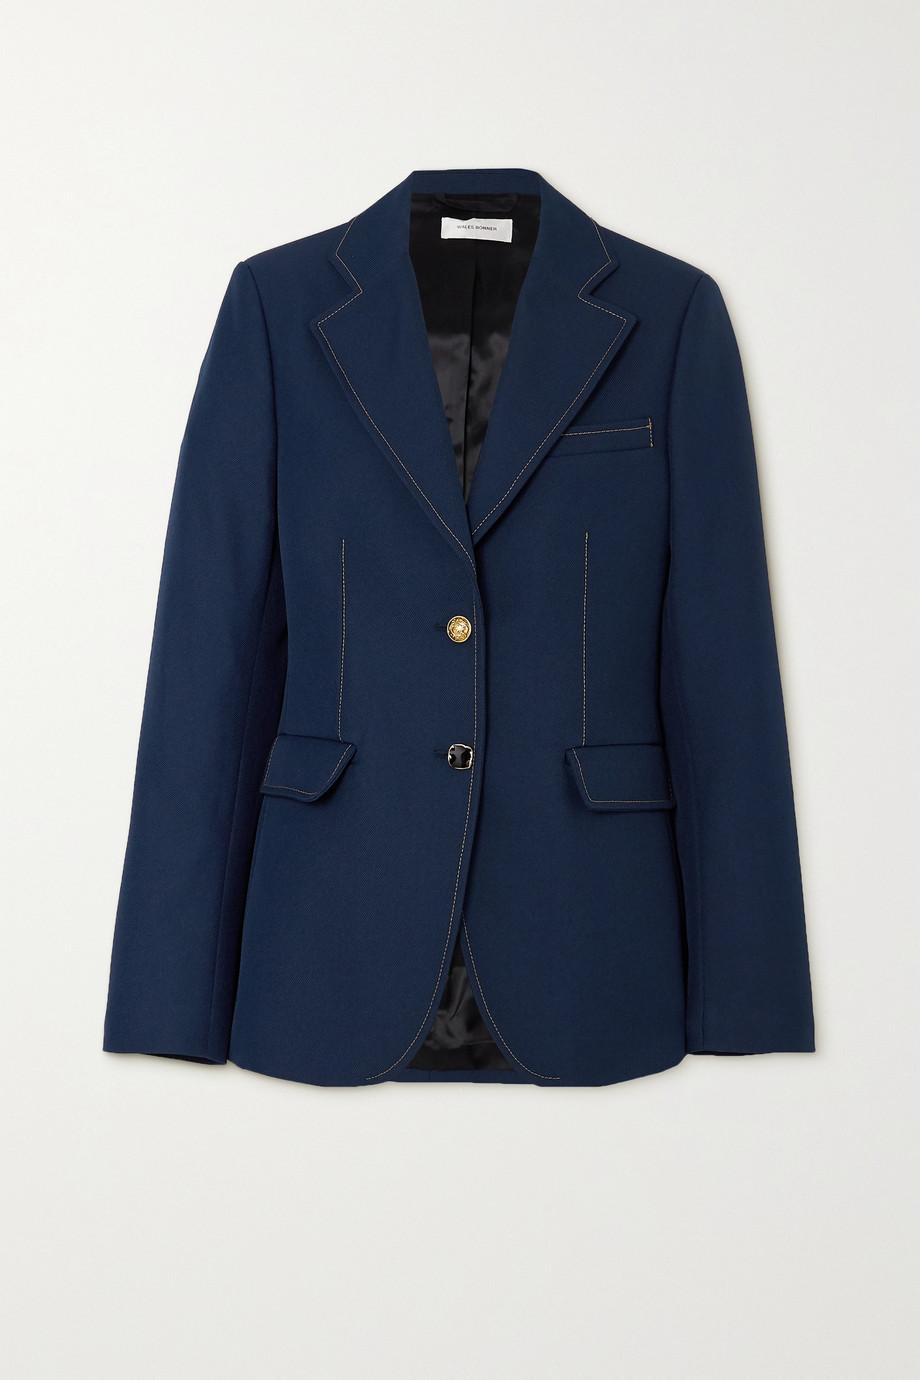 Wales Bonner Blues 明线细节斜纹布西装外套